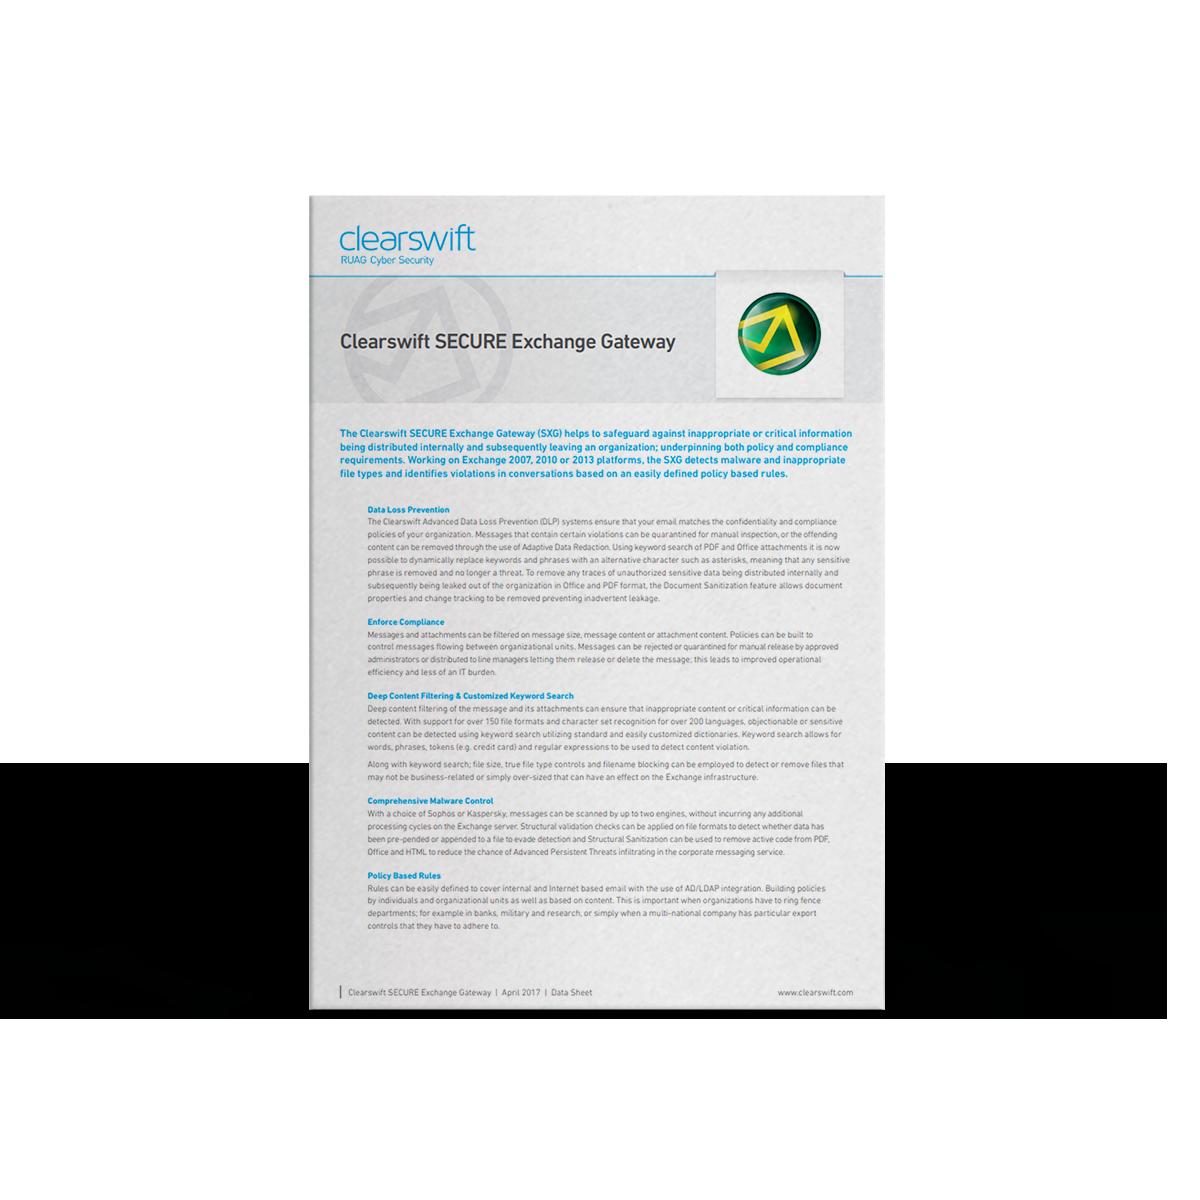 Clearswift SECURE Exchange Gateway datasheet | Clearswift